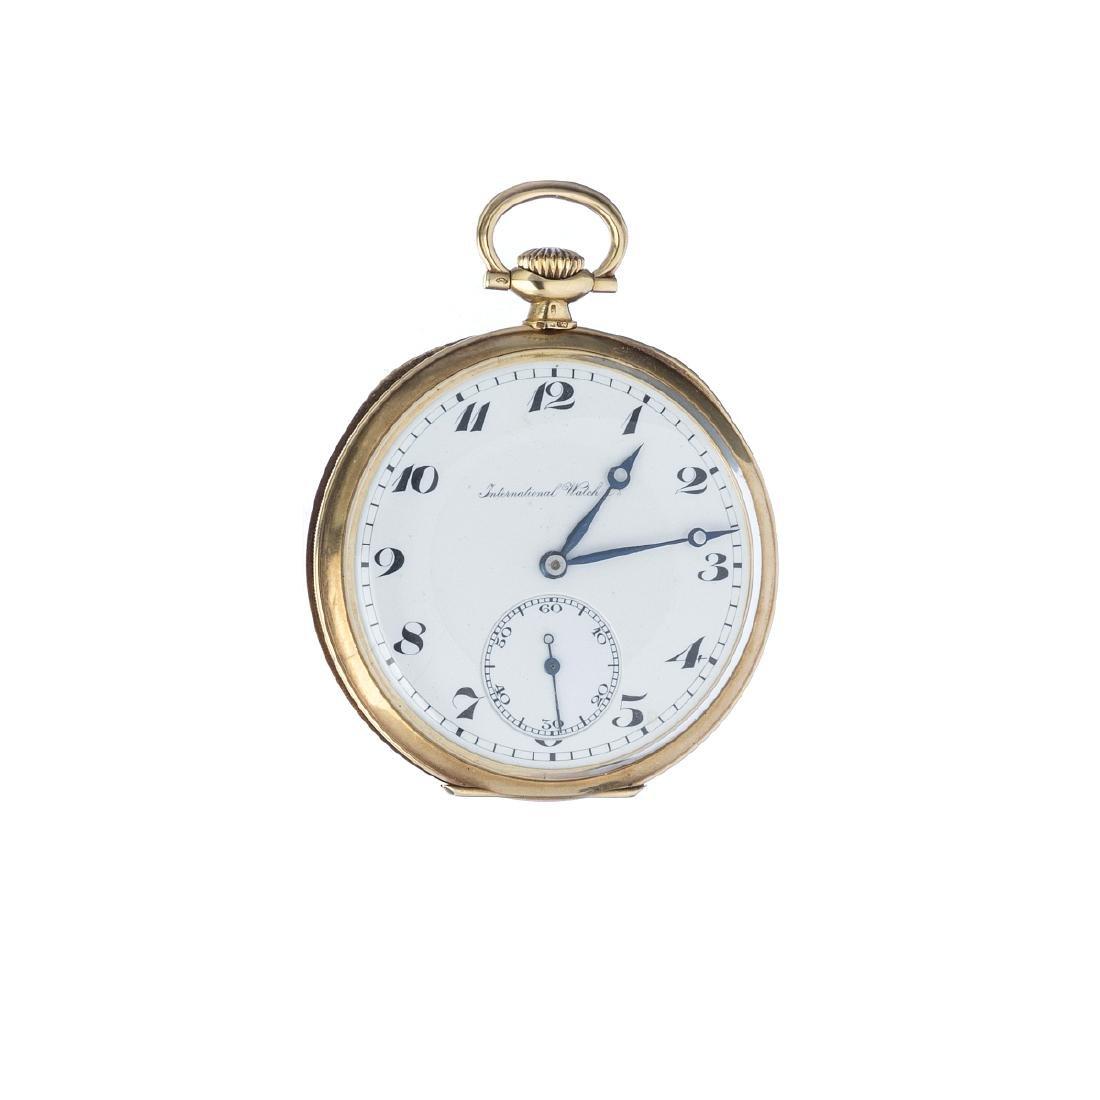 INTERNATIONAL WATCH & Co. - Pocket watch